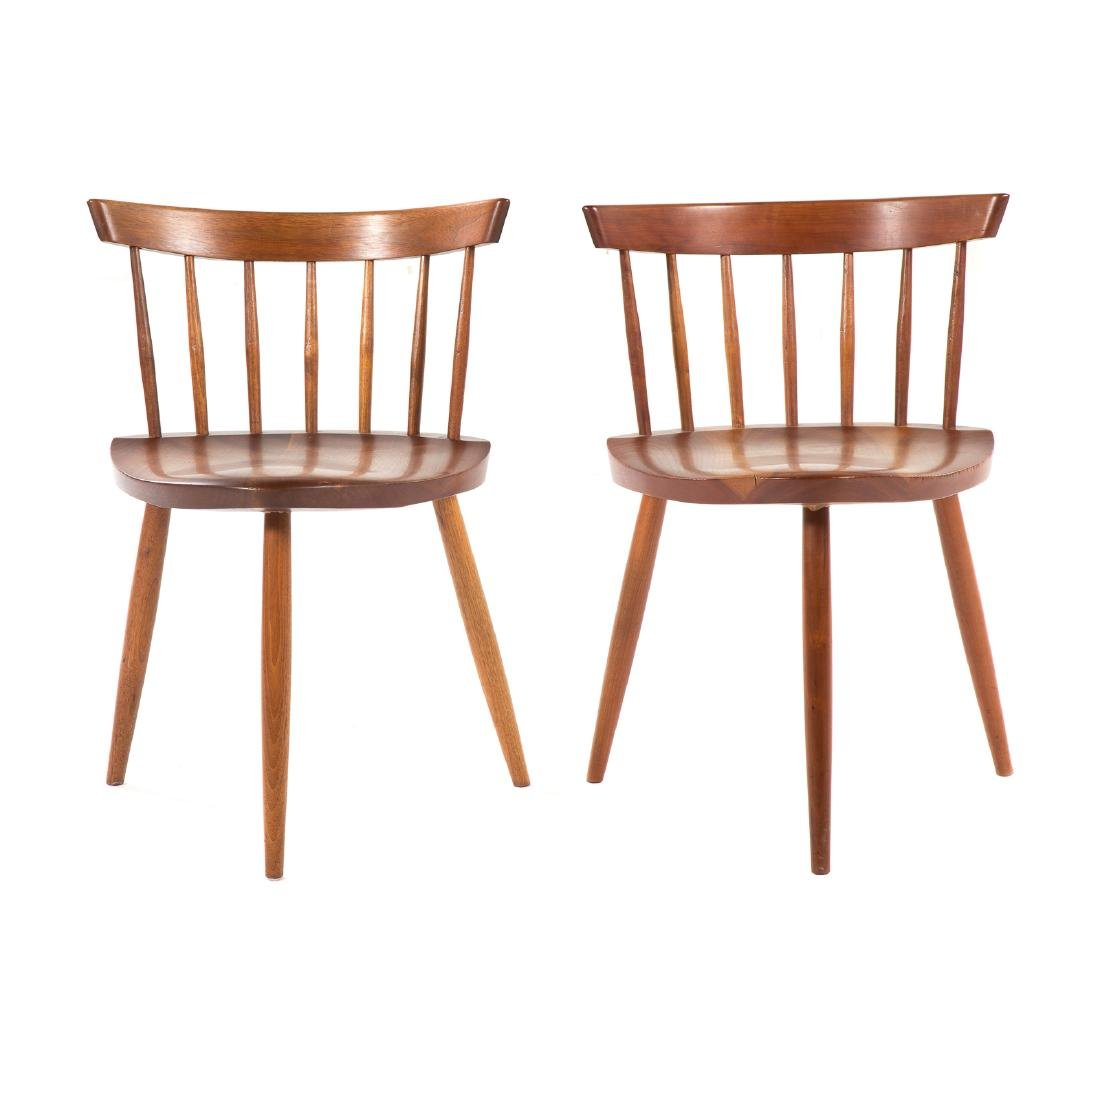 Two George Nakashima Mira Chairs